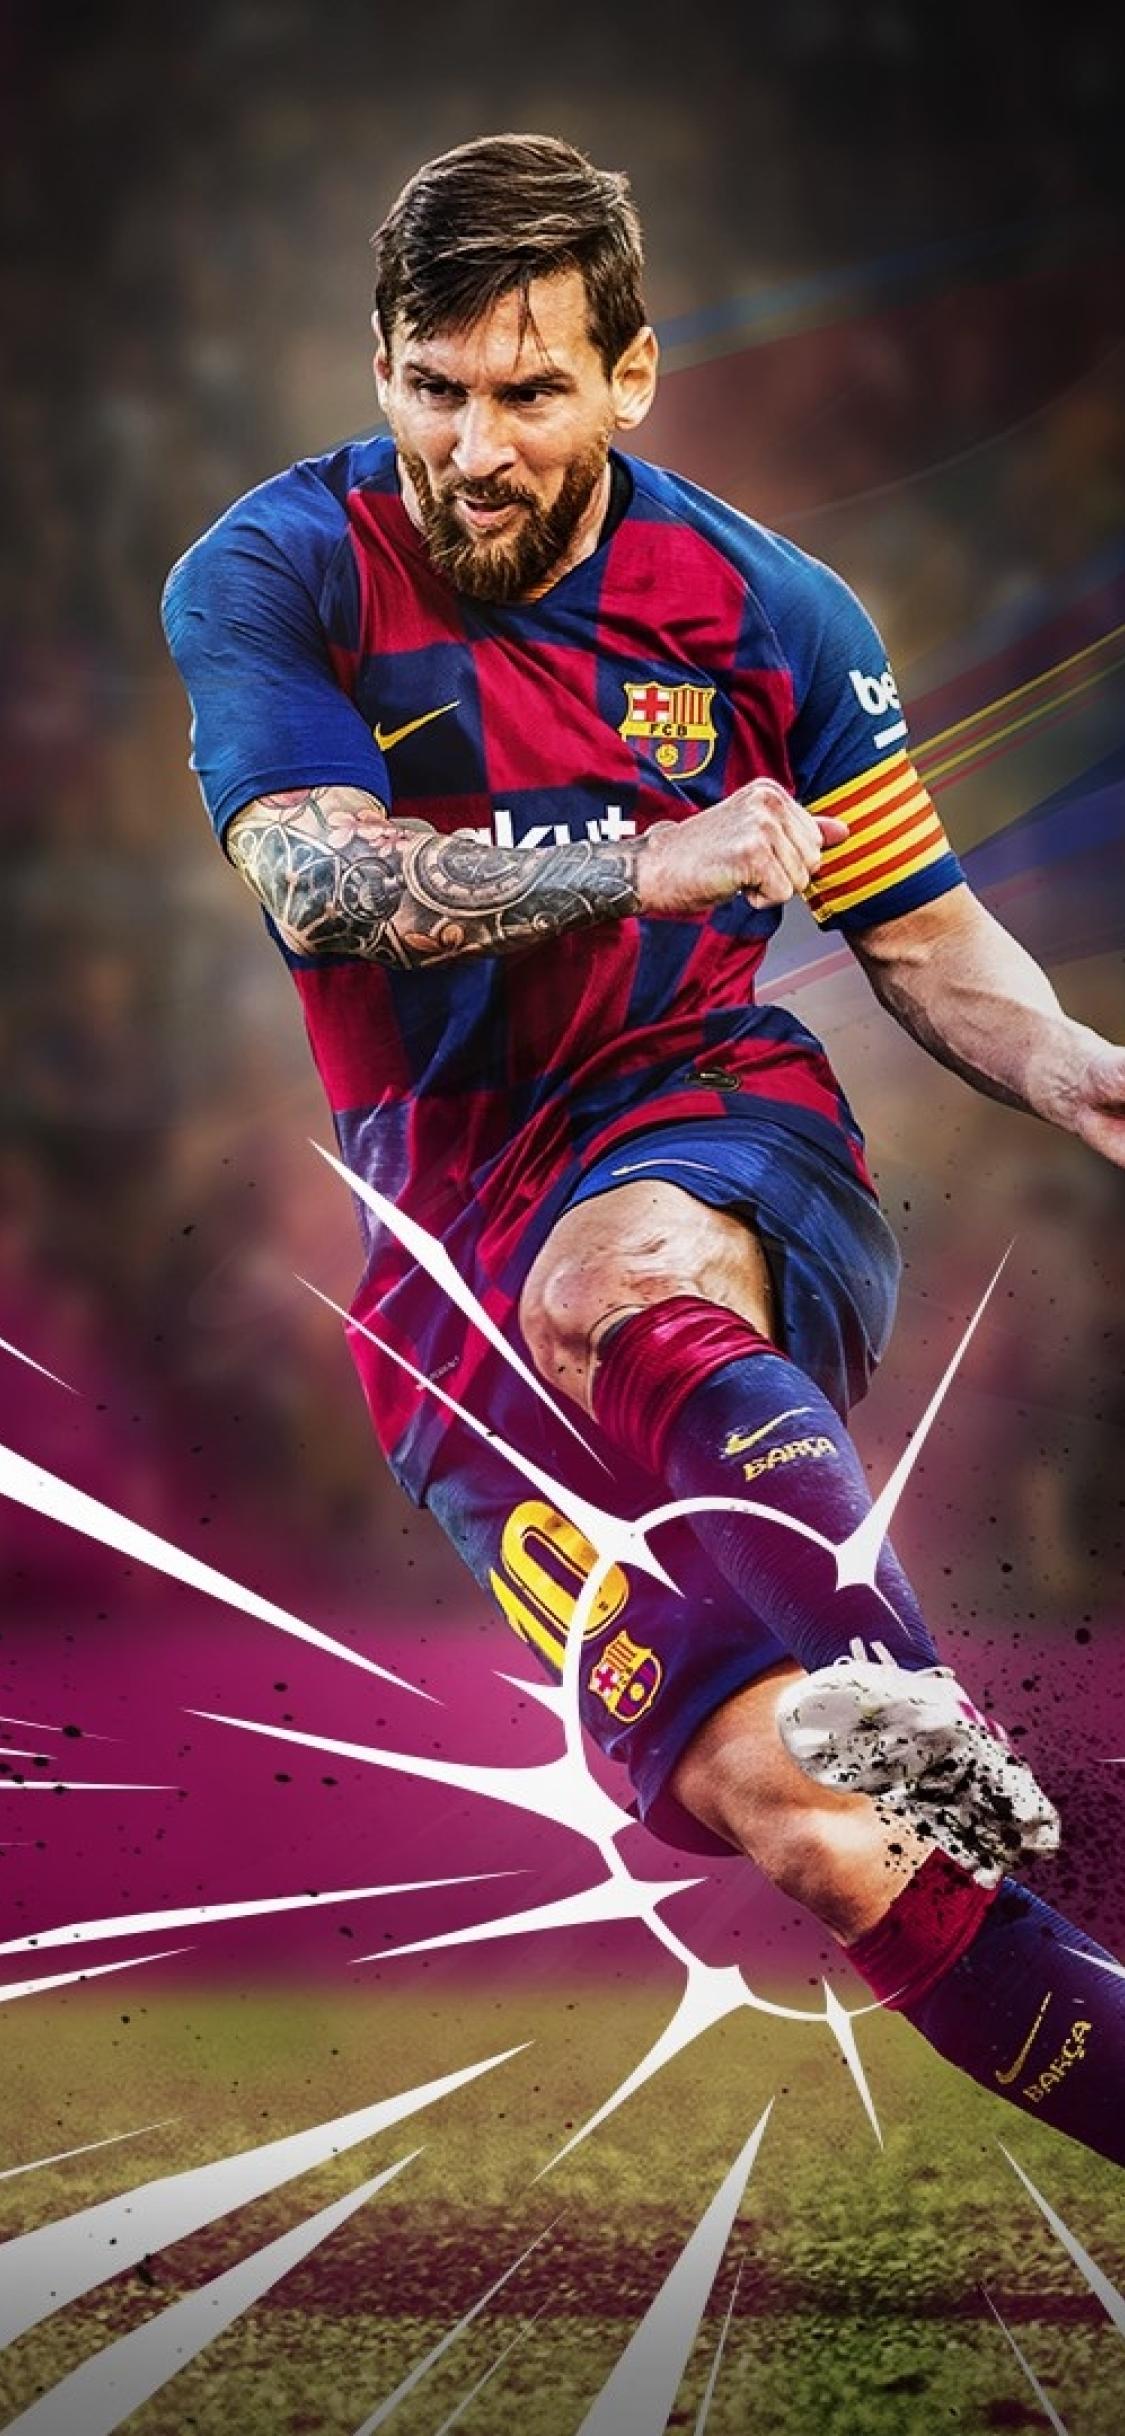 Messi 2020 4k Mobile Wallpapers - Wallpaper Cave